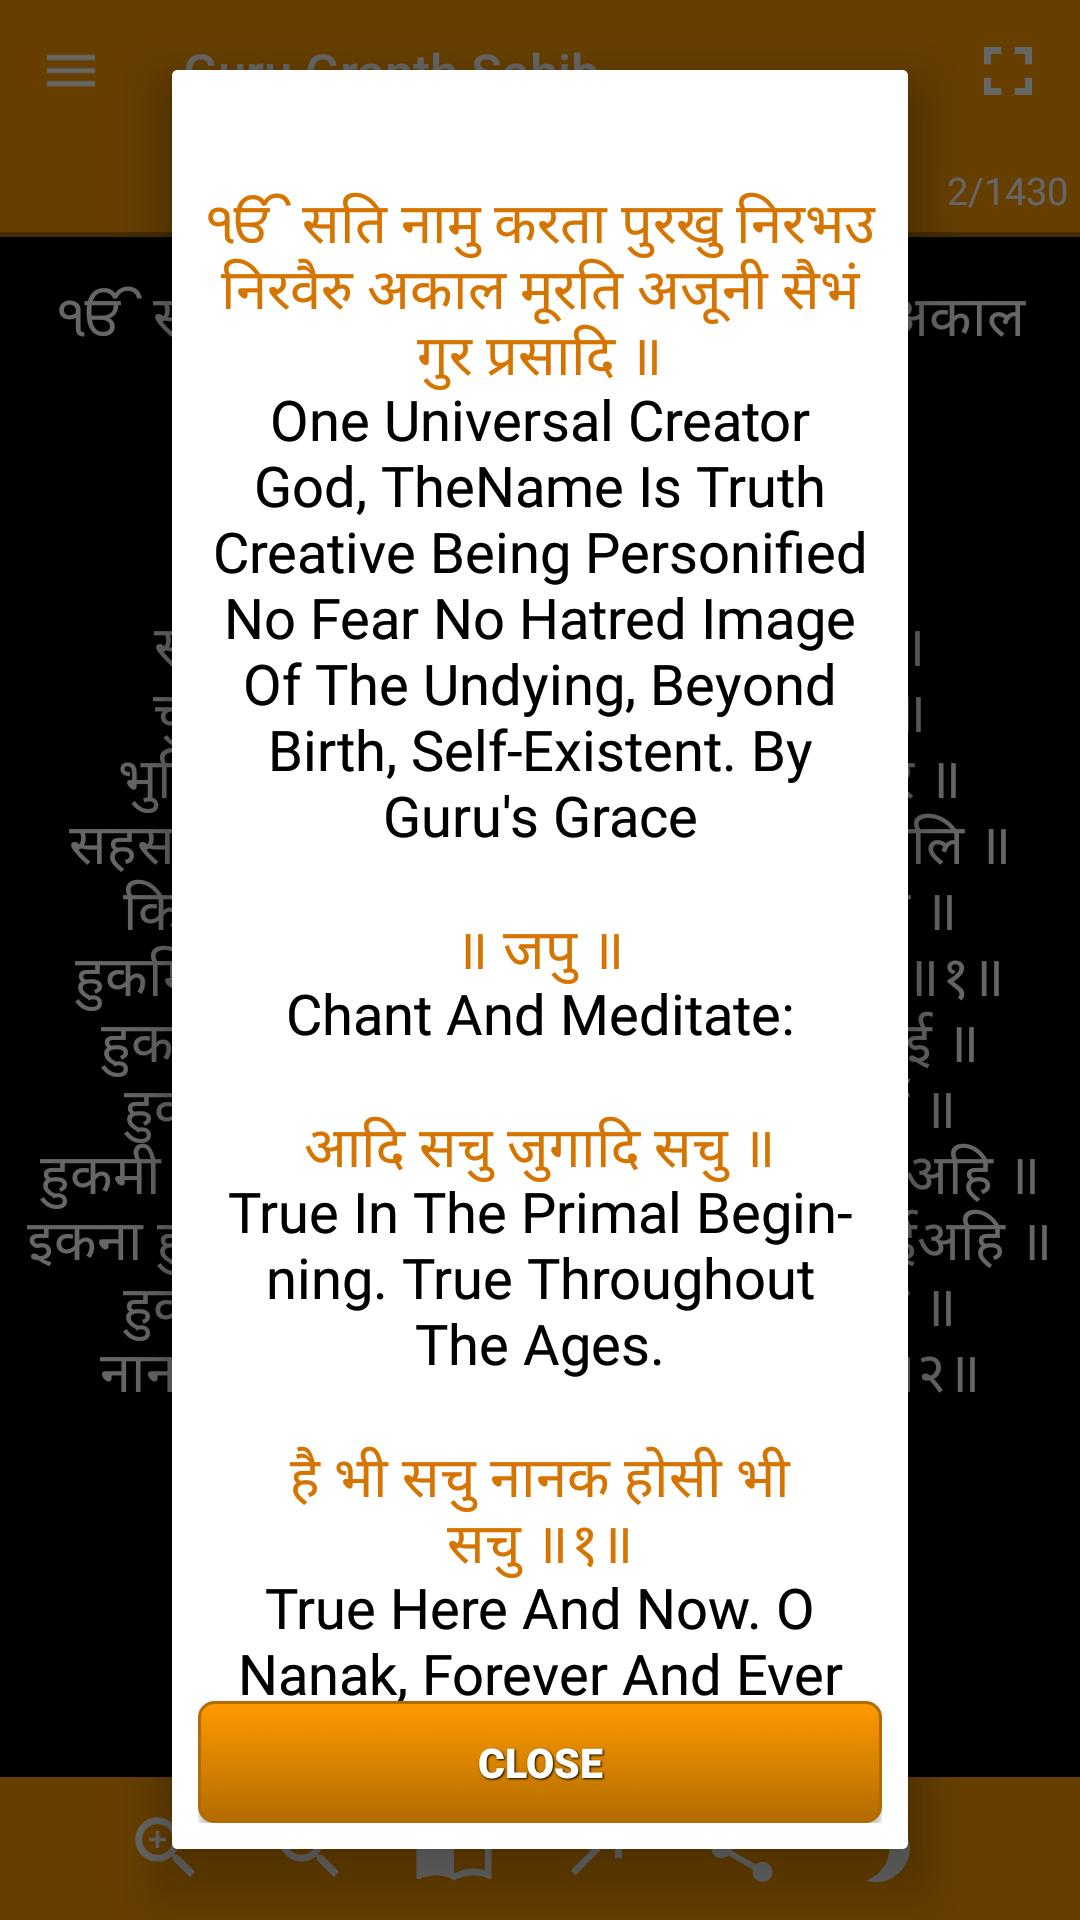 Guru Granth Sahib for Android - APK Download